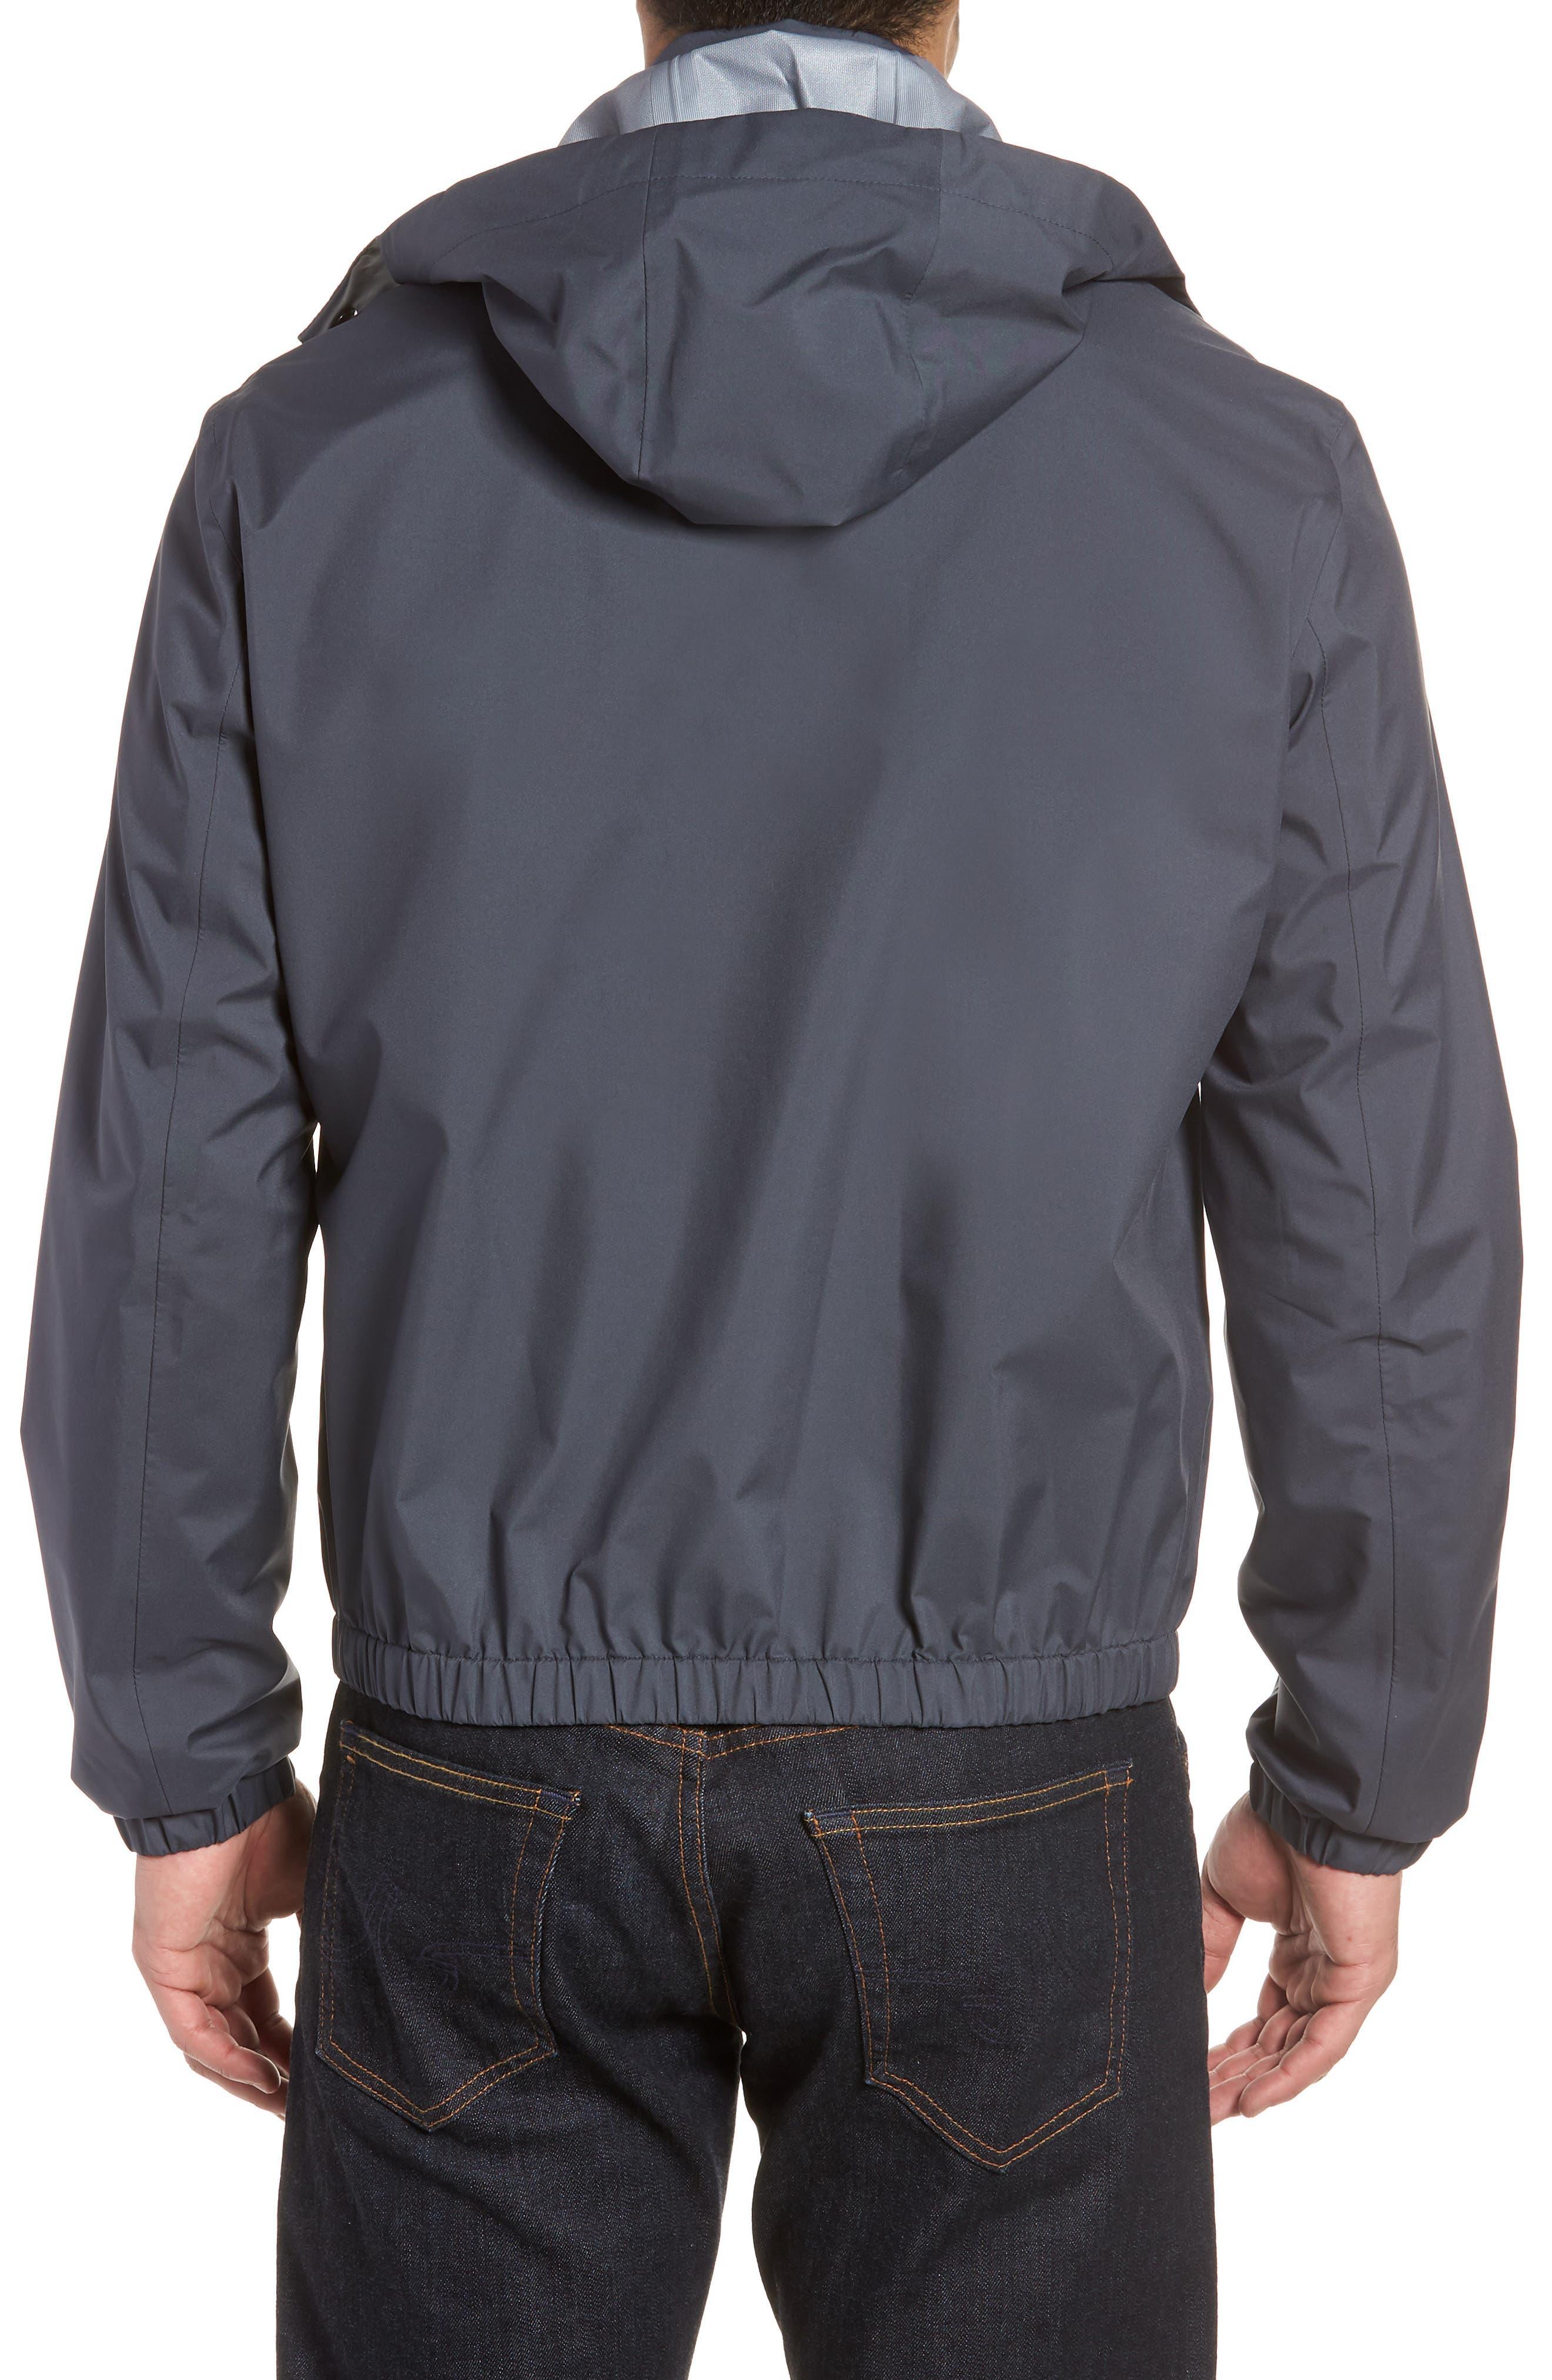 Regular Fit Jacket,                             Alternate thumbnail 2, color,                             Slate